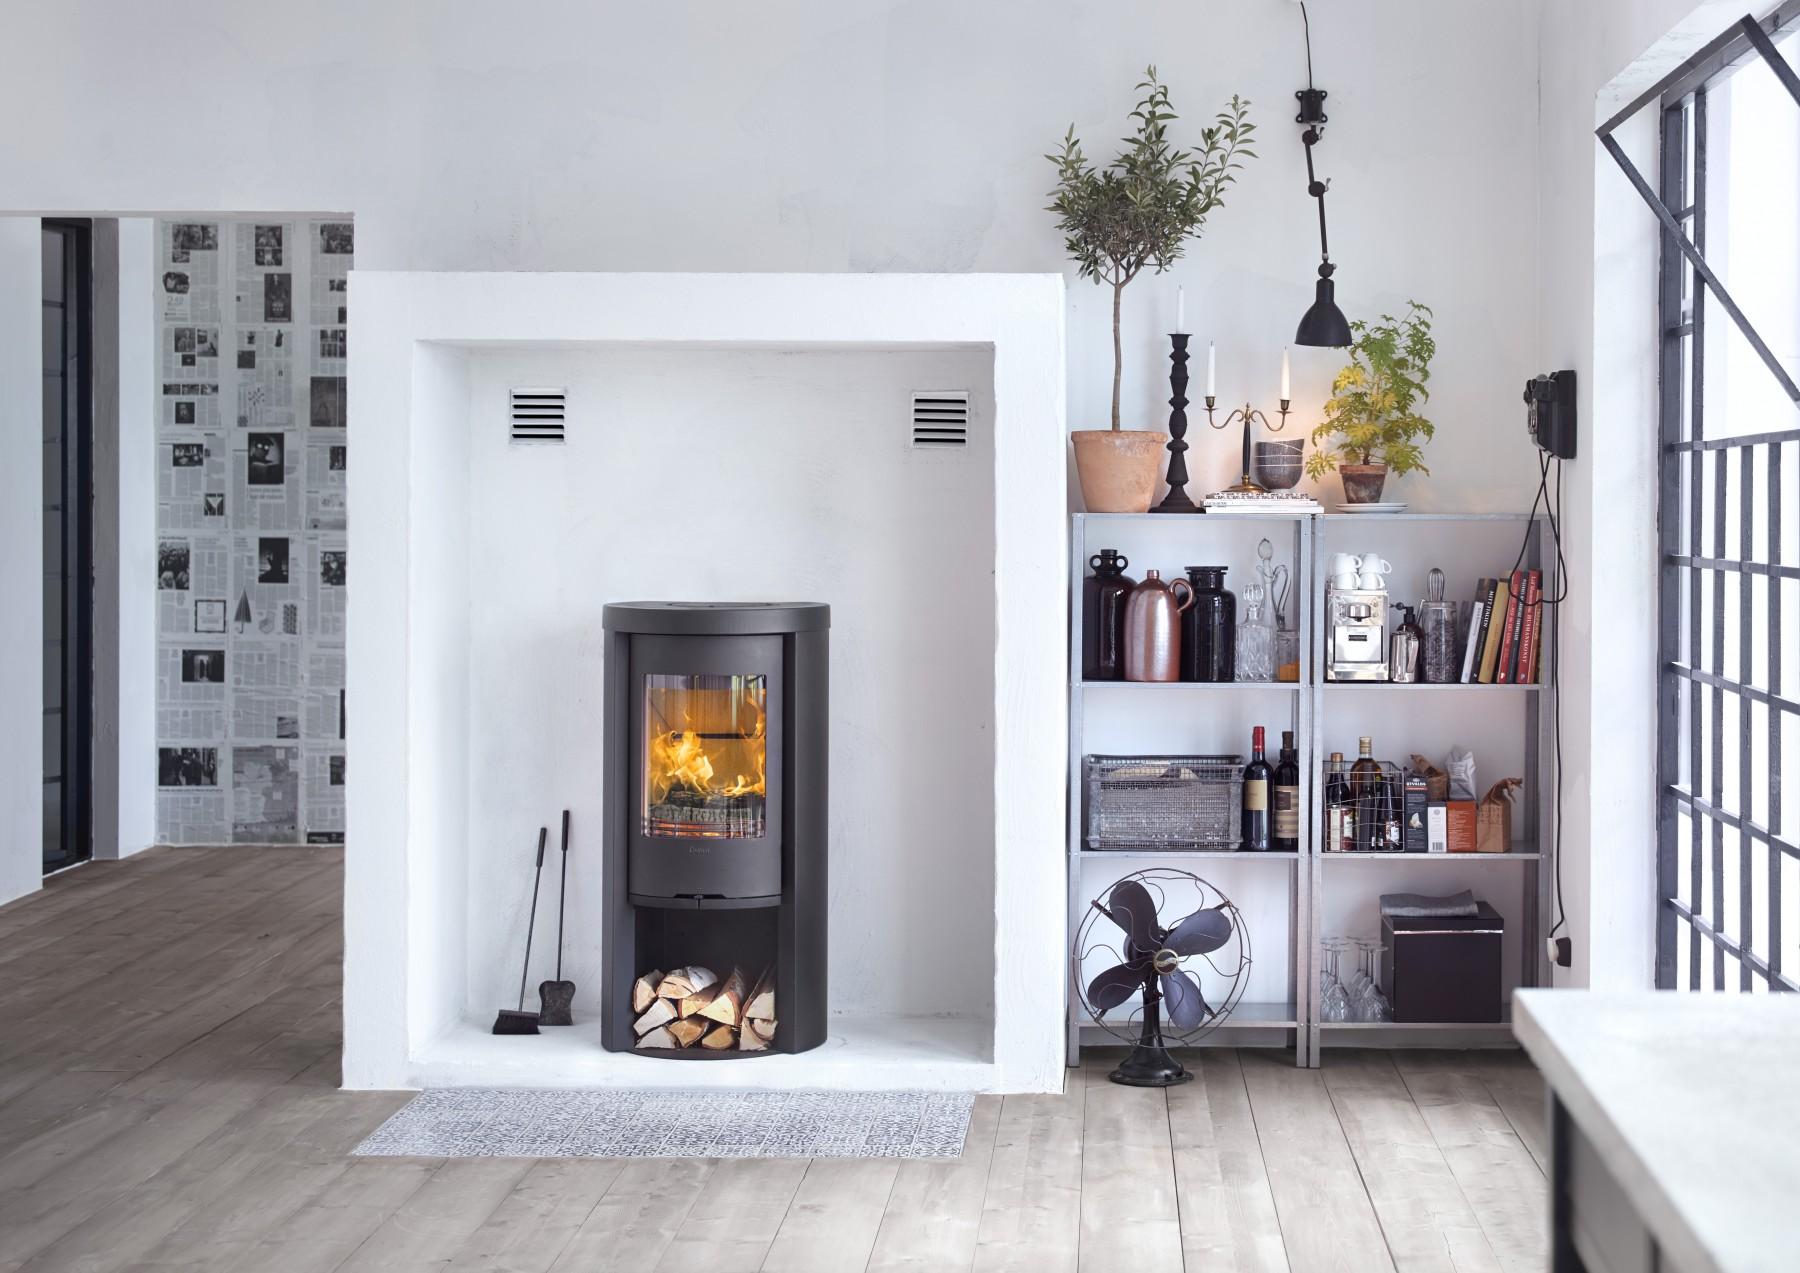 contura 520 style bei feuerland in kiel. Black Bedroom Furniture Sets. Home Design Ideas